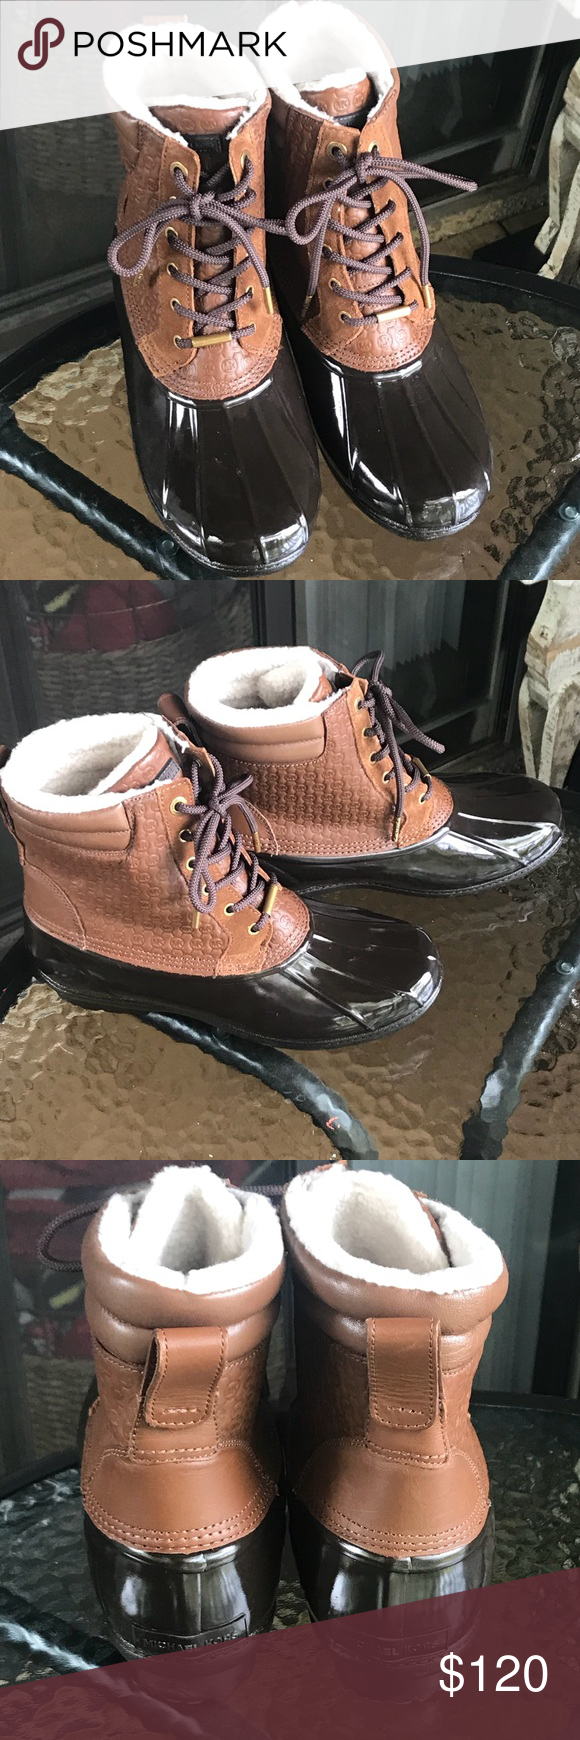 Michael Kors brown Easton duck boots